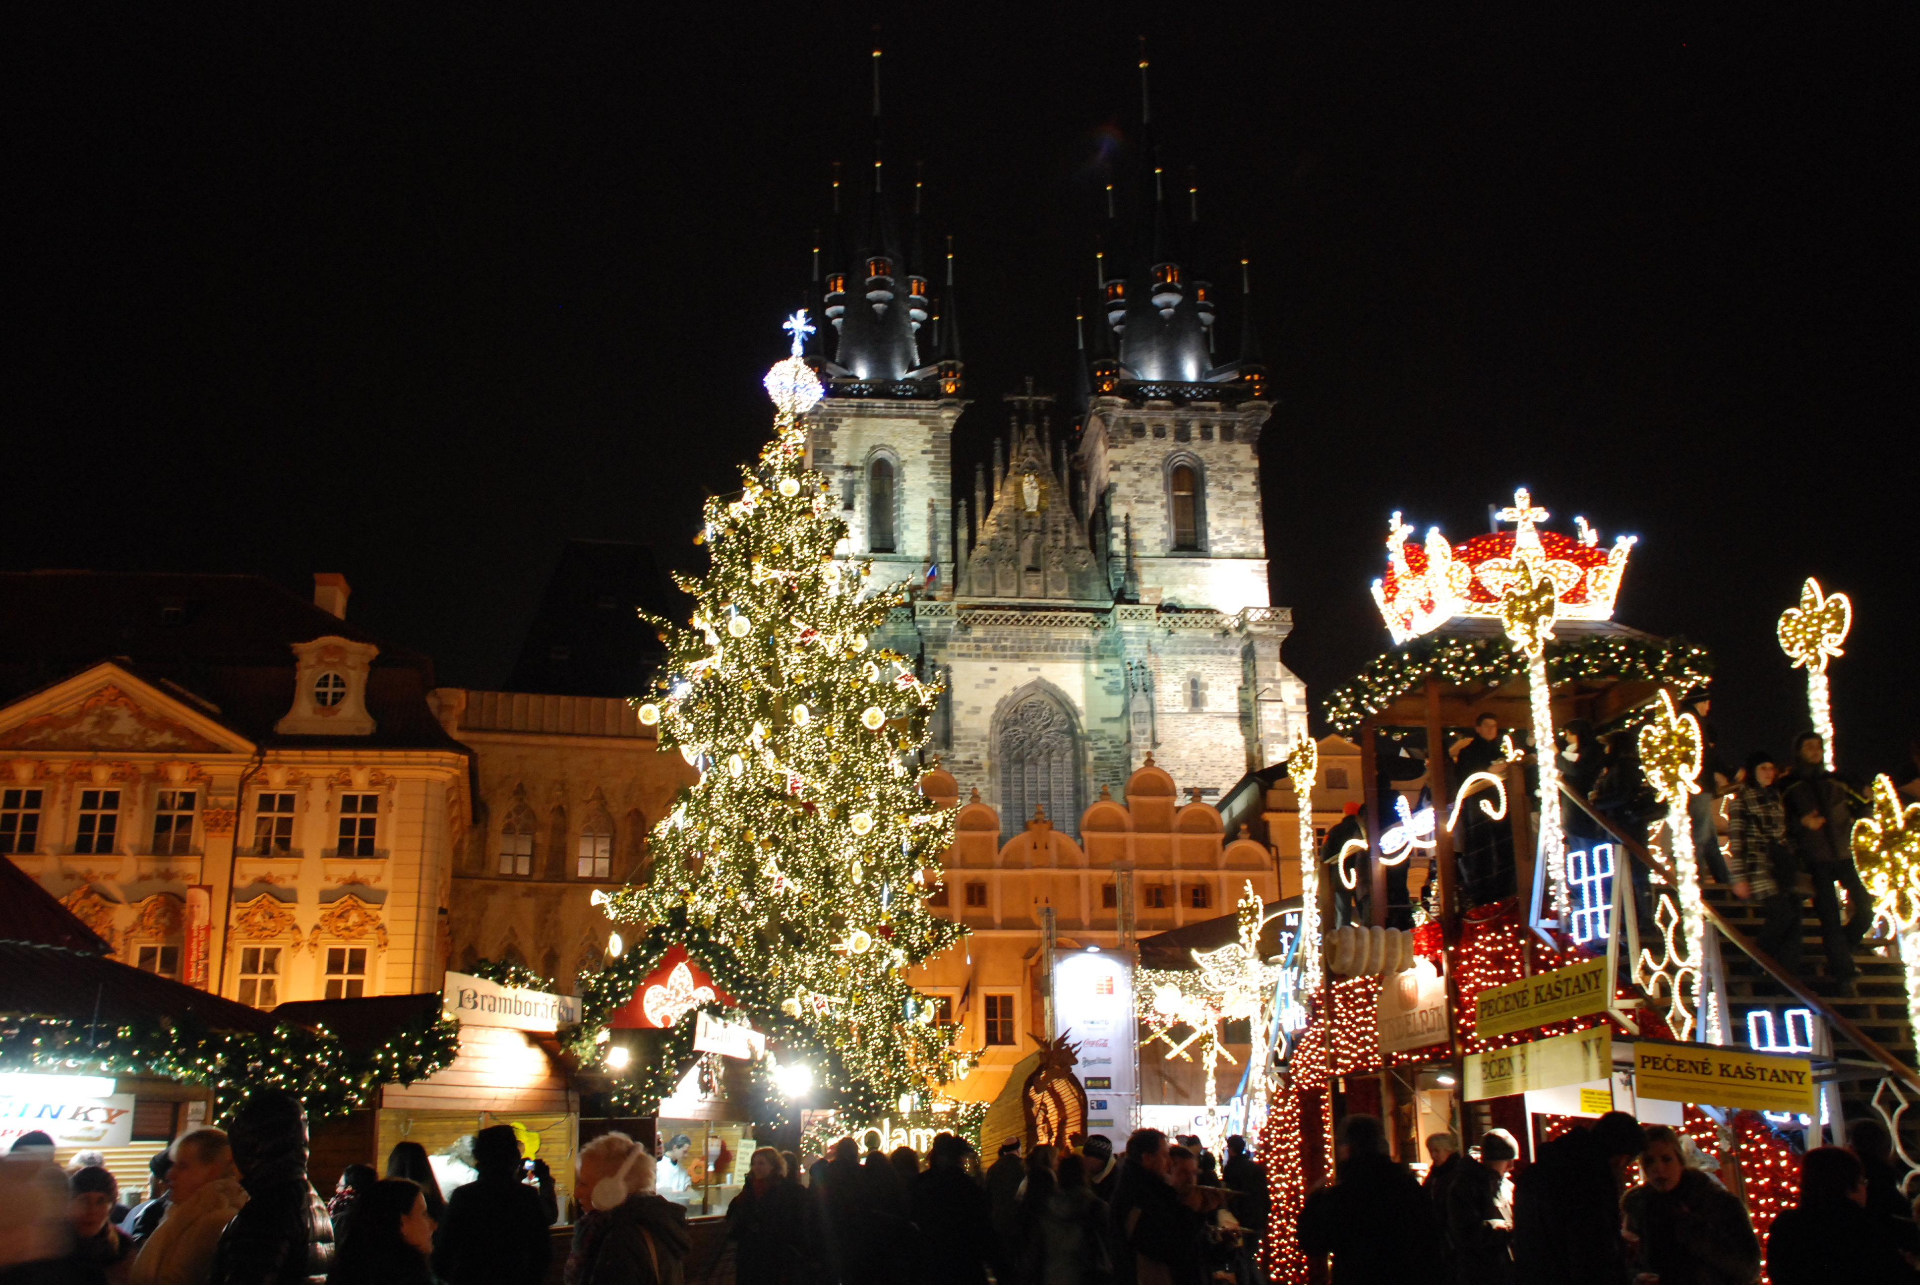 Mercatini di Natale: i 10 mercatini più belli d'Europa